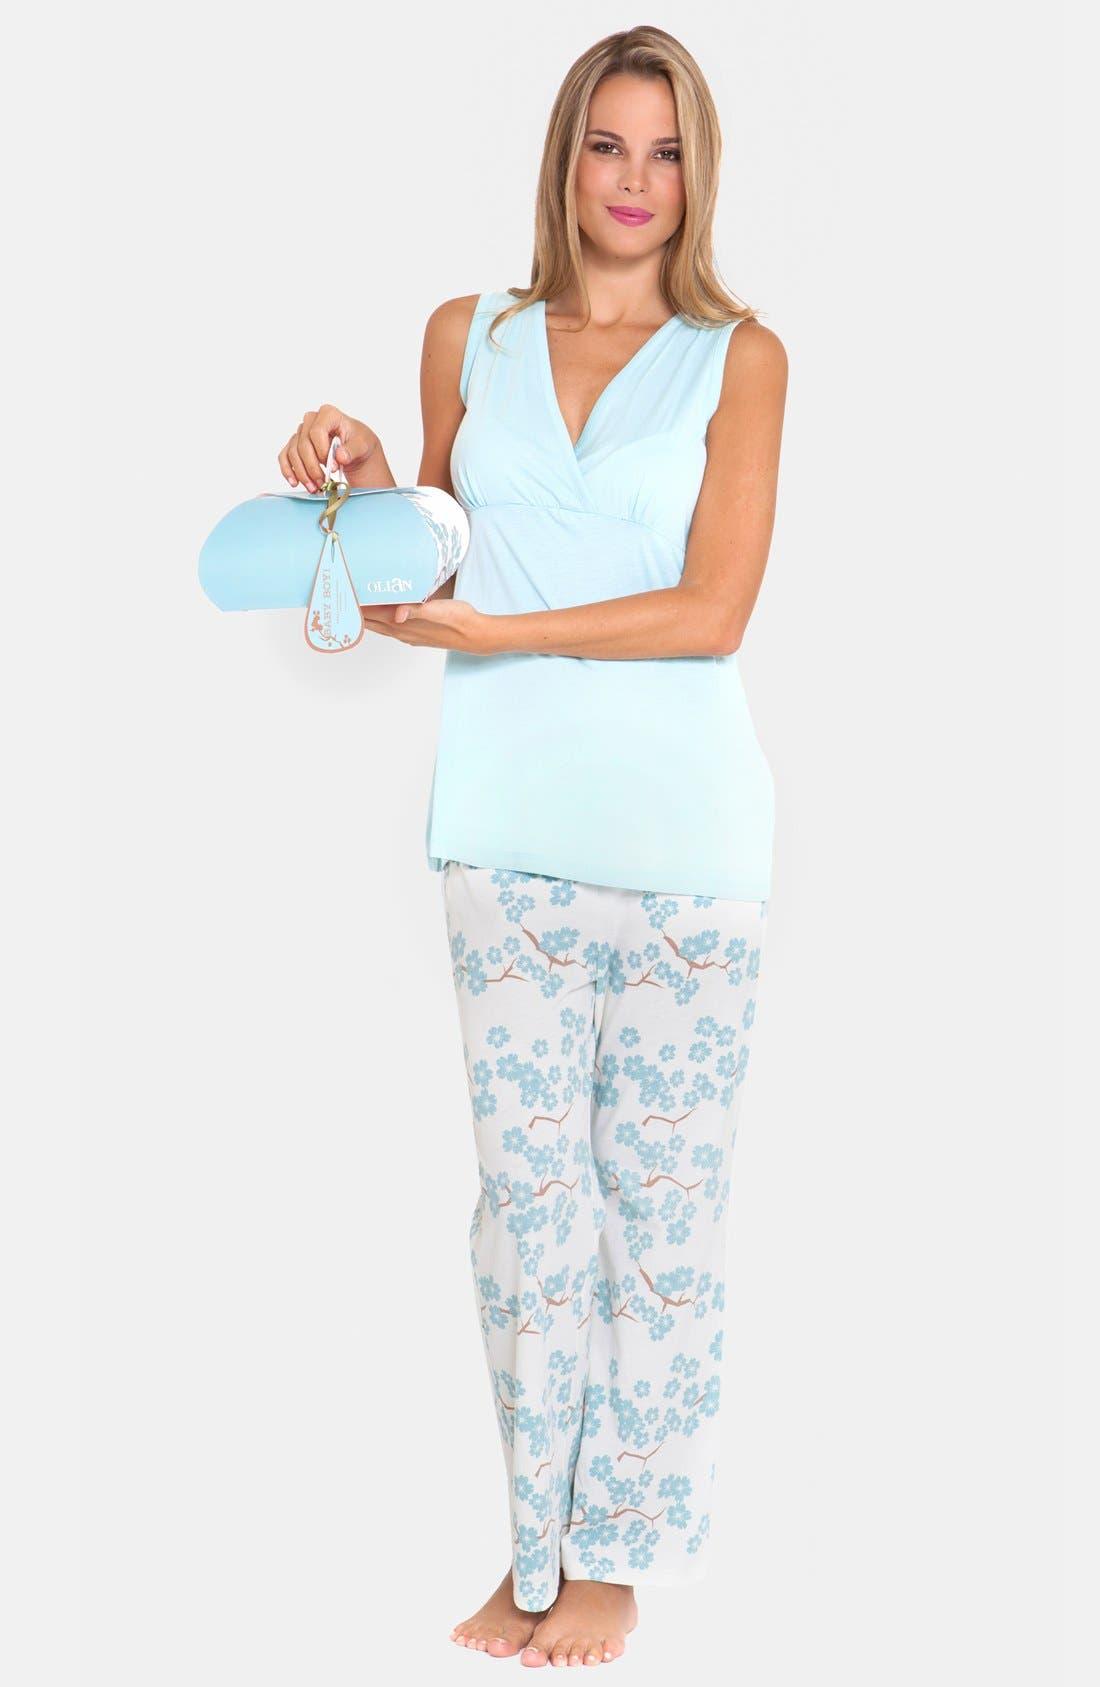 4-Piece Maternity Sleepwear Gift Set,                             Alternate thumbnail 6, color,